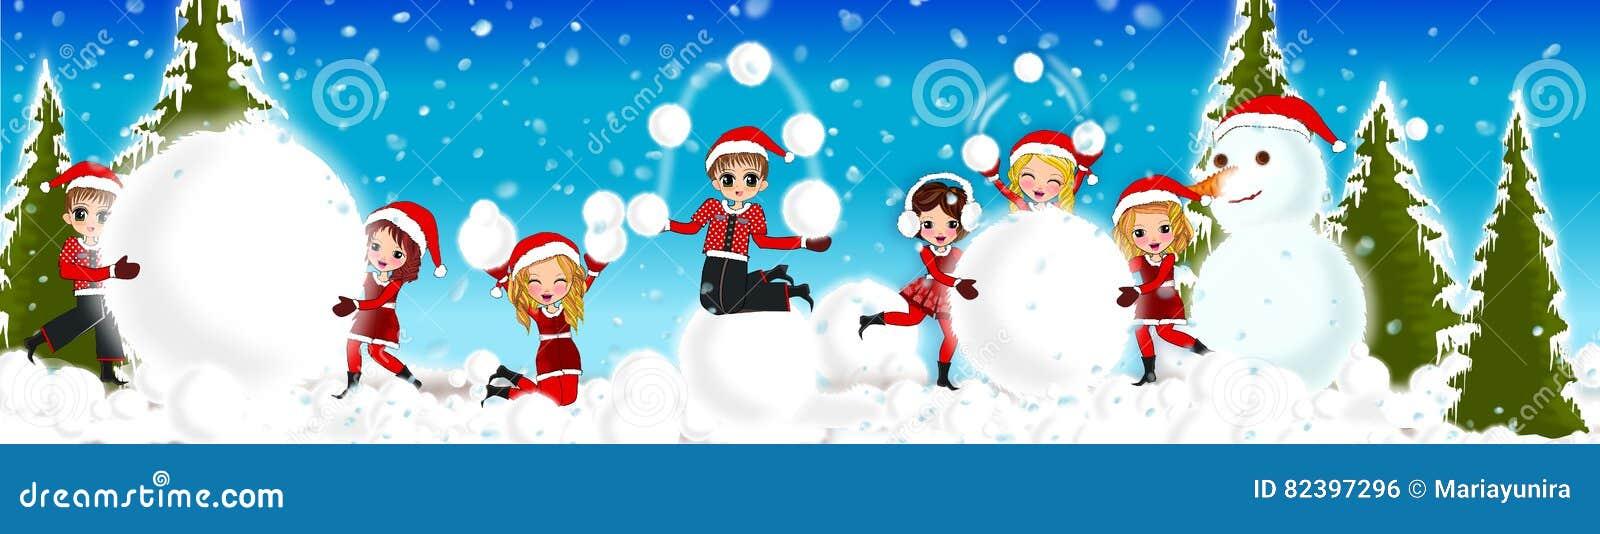 Christmas kids snow stock illustration. Illustration of snow - 82397296